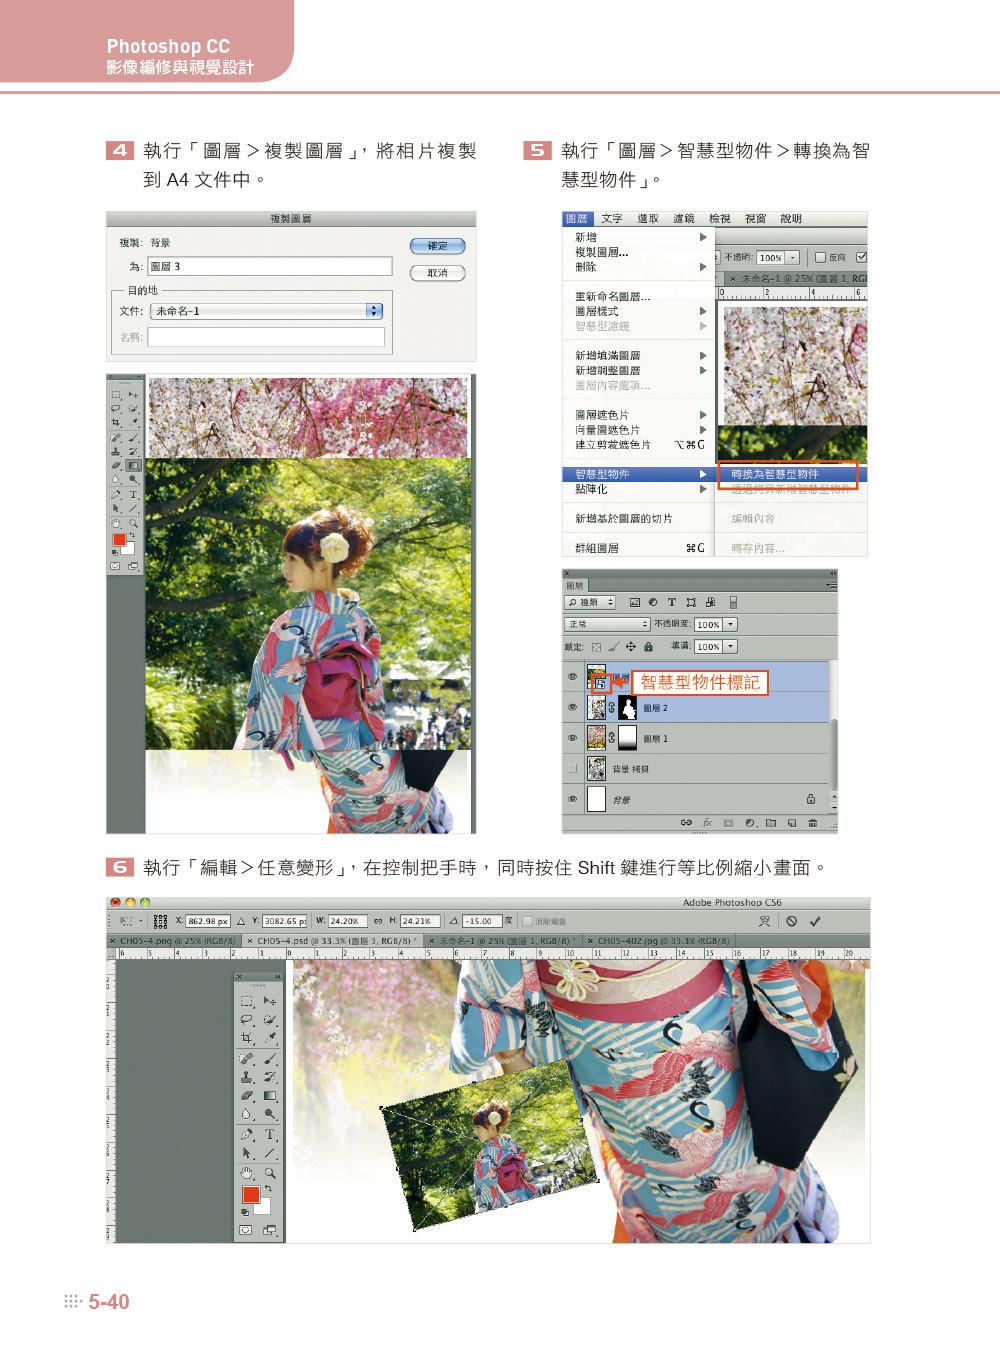 Photoshop CC 影像編修與視覺設計 (含ACA-Photoshop CC國際認證完全模擬與解題)-preview-9